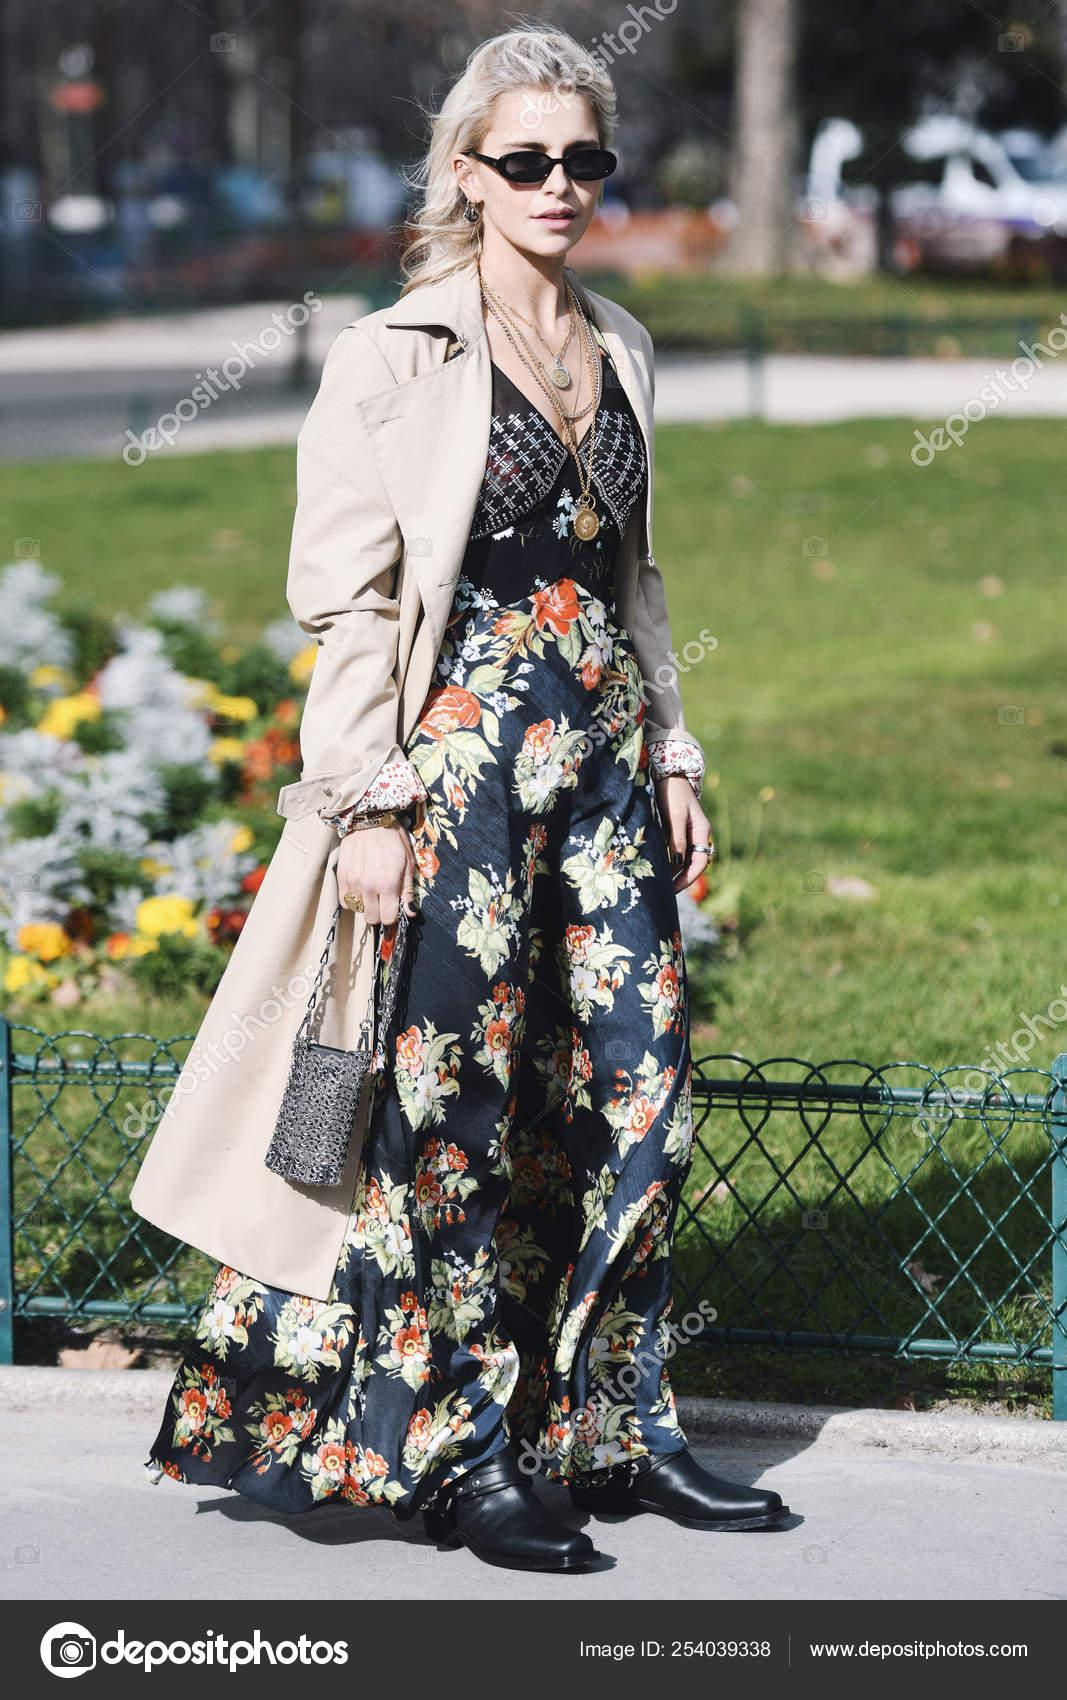 6a5772b039850 Paris France February 2019 Street Style Outfit Caroline Daur Fashion —  Stock Photo